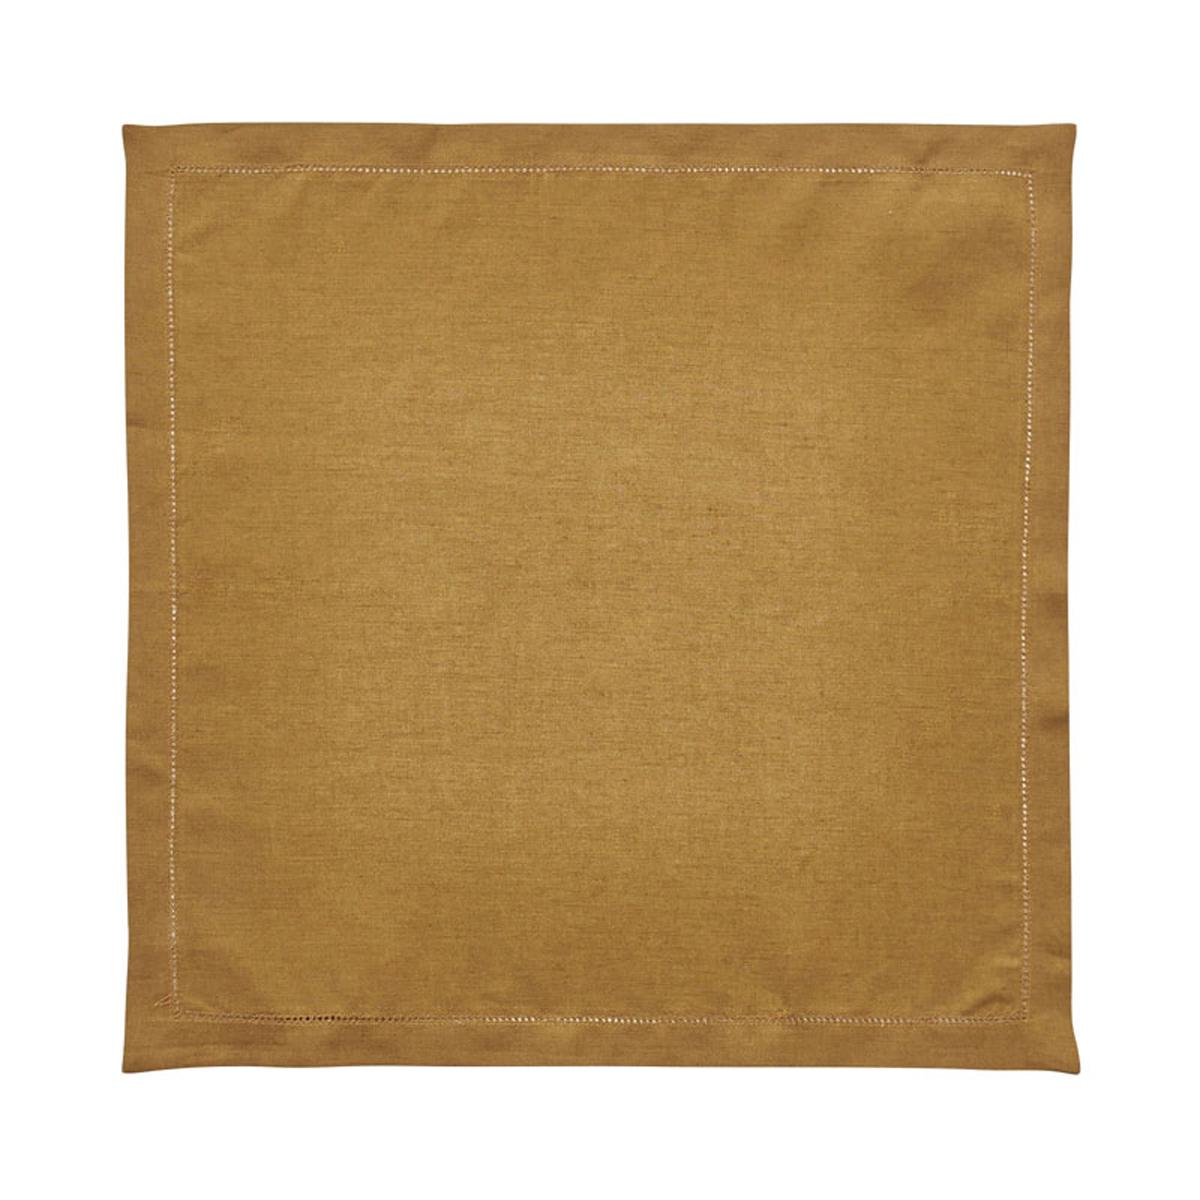 Serviette de table en lin marron 45x45